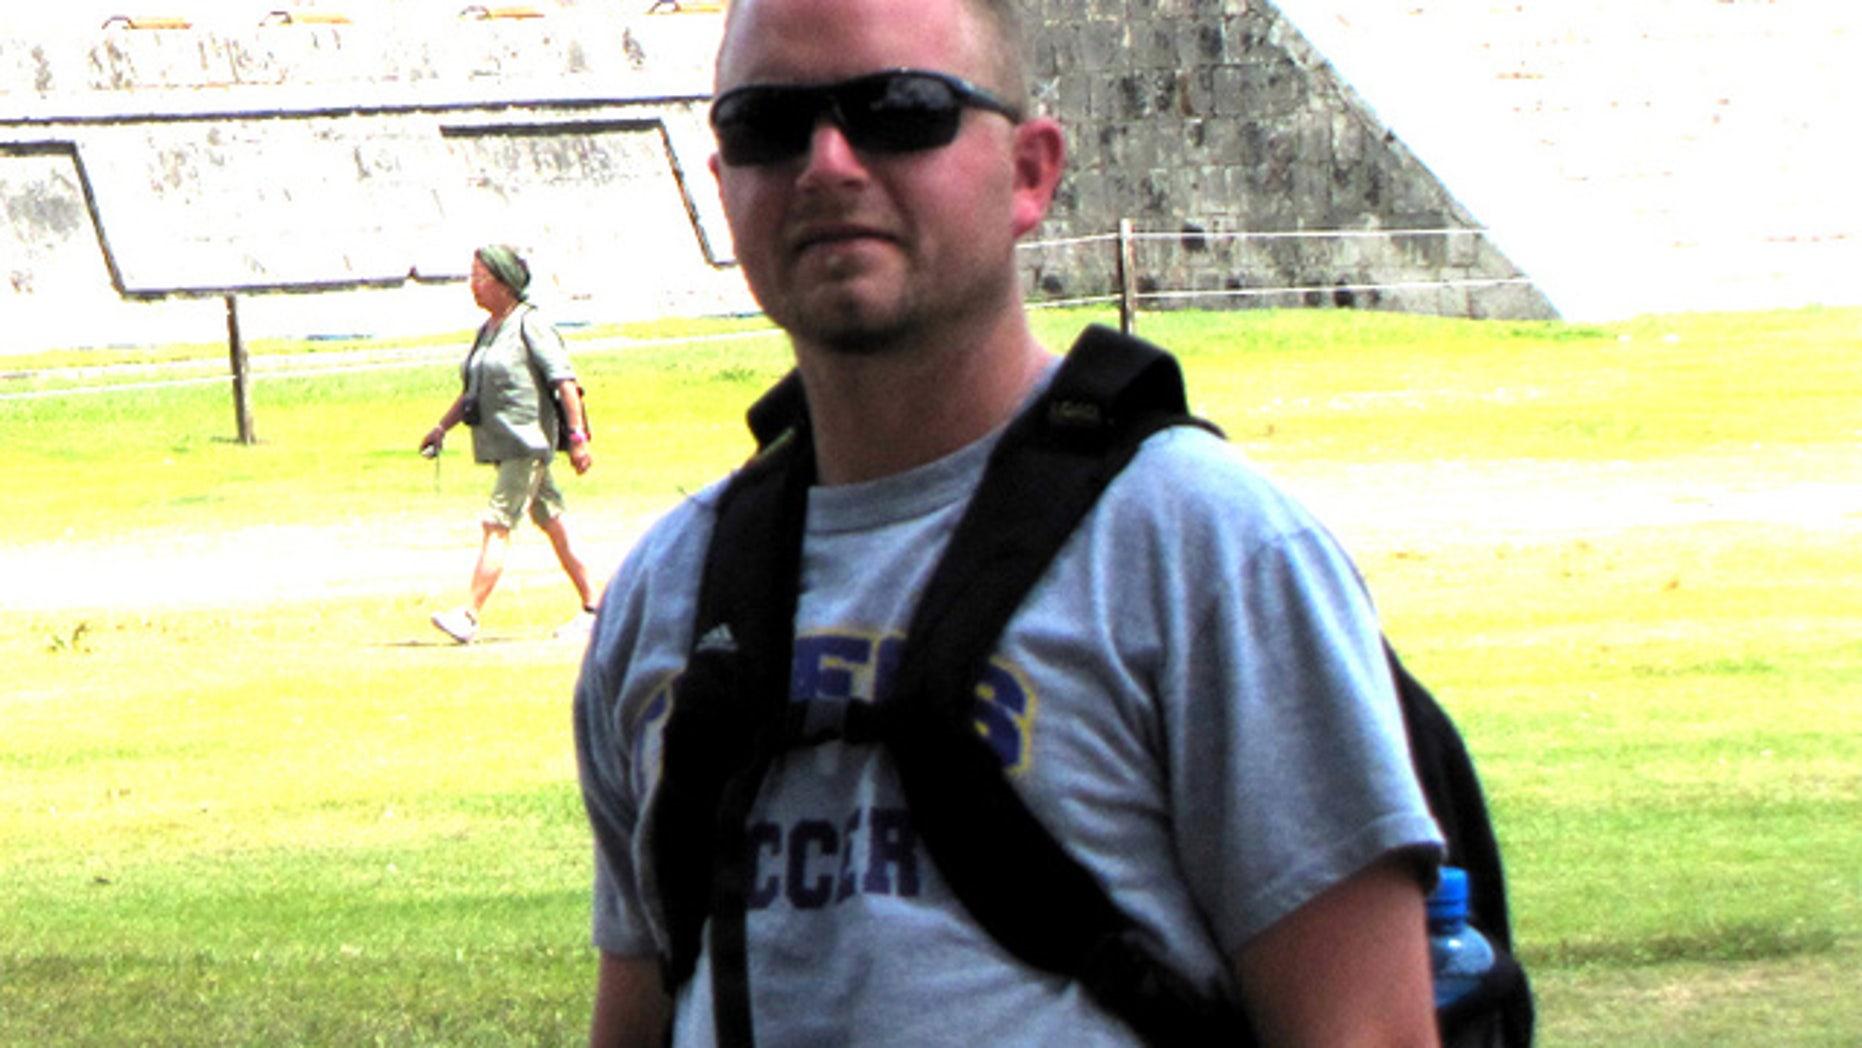 Chris Matthews, 33, soccer coach killed in parking lot attack.